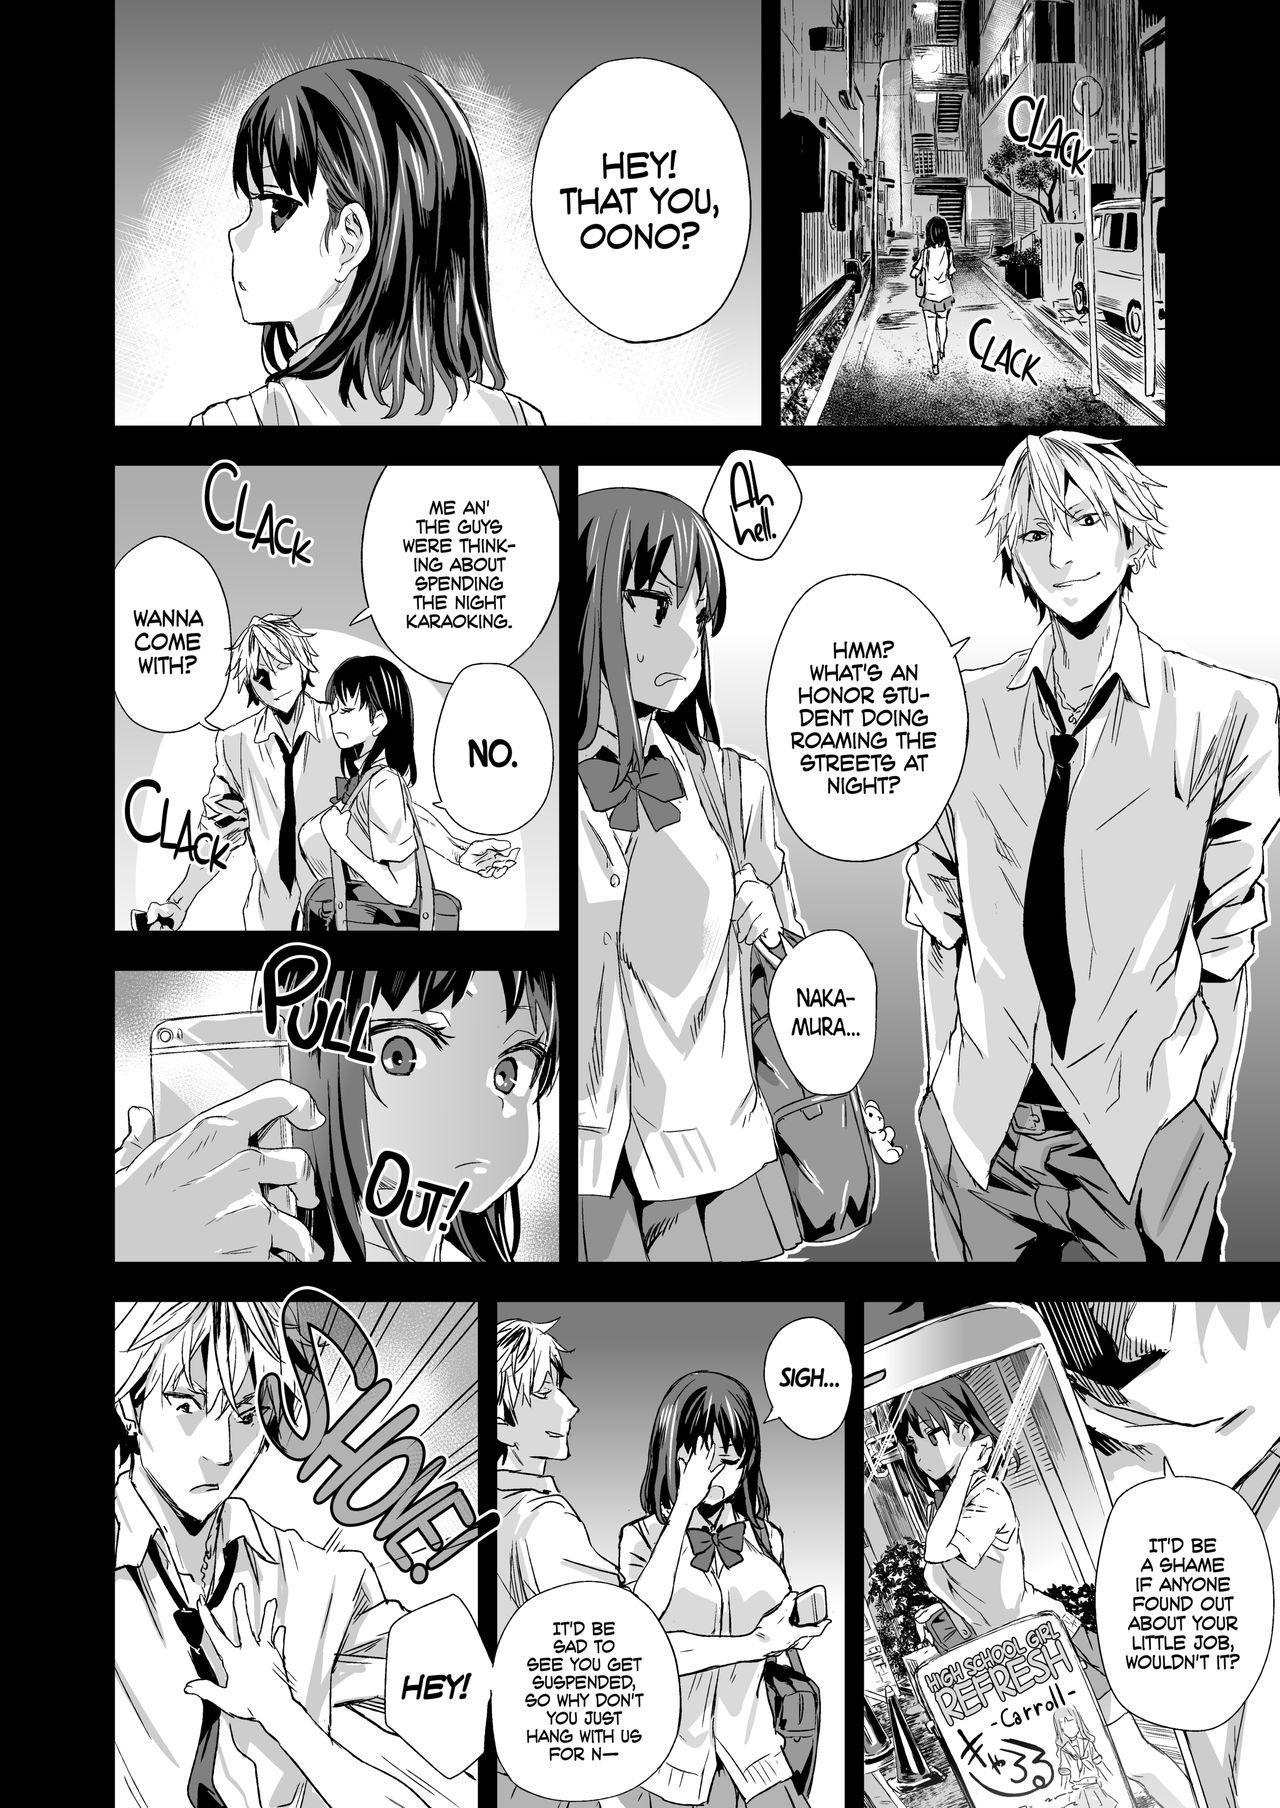 "[Fatalpulse (Asanagi)] VictimGirlsR ""JK de Refre -Flesh & Refresh-"" [English] [2D-Market.com] [Decensored] [Digital] 4"